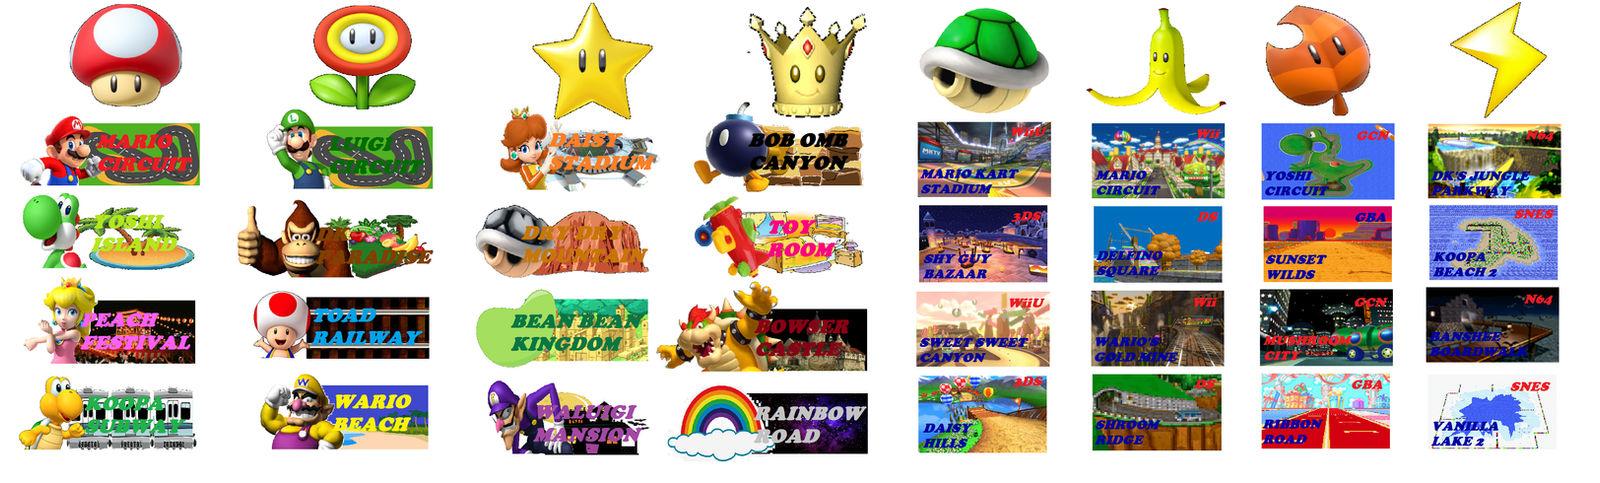 Mario Kart 9 Courses By Kagebankai On Deviantart